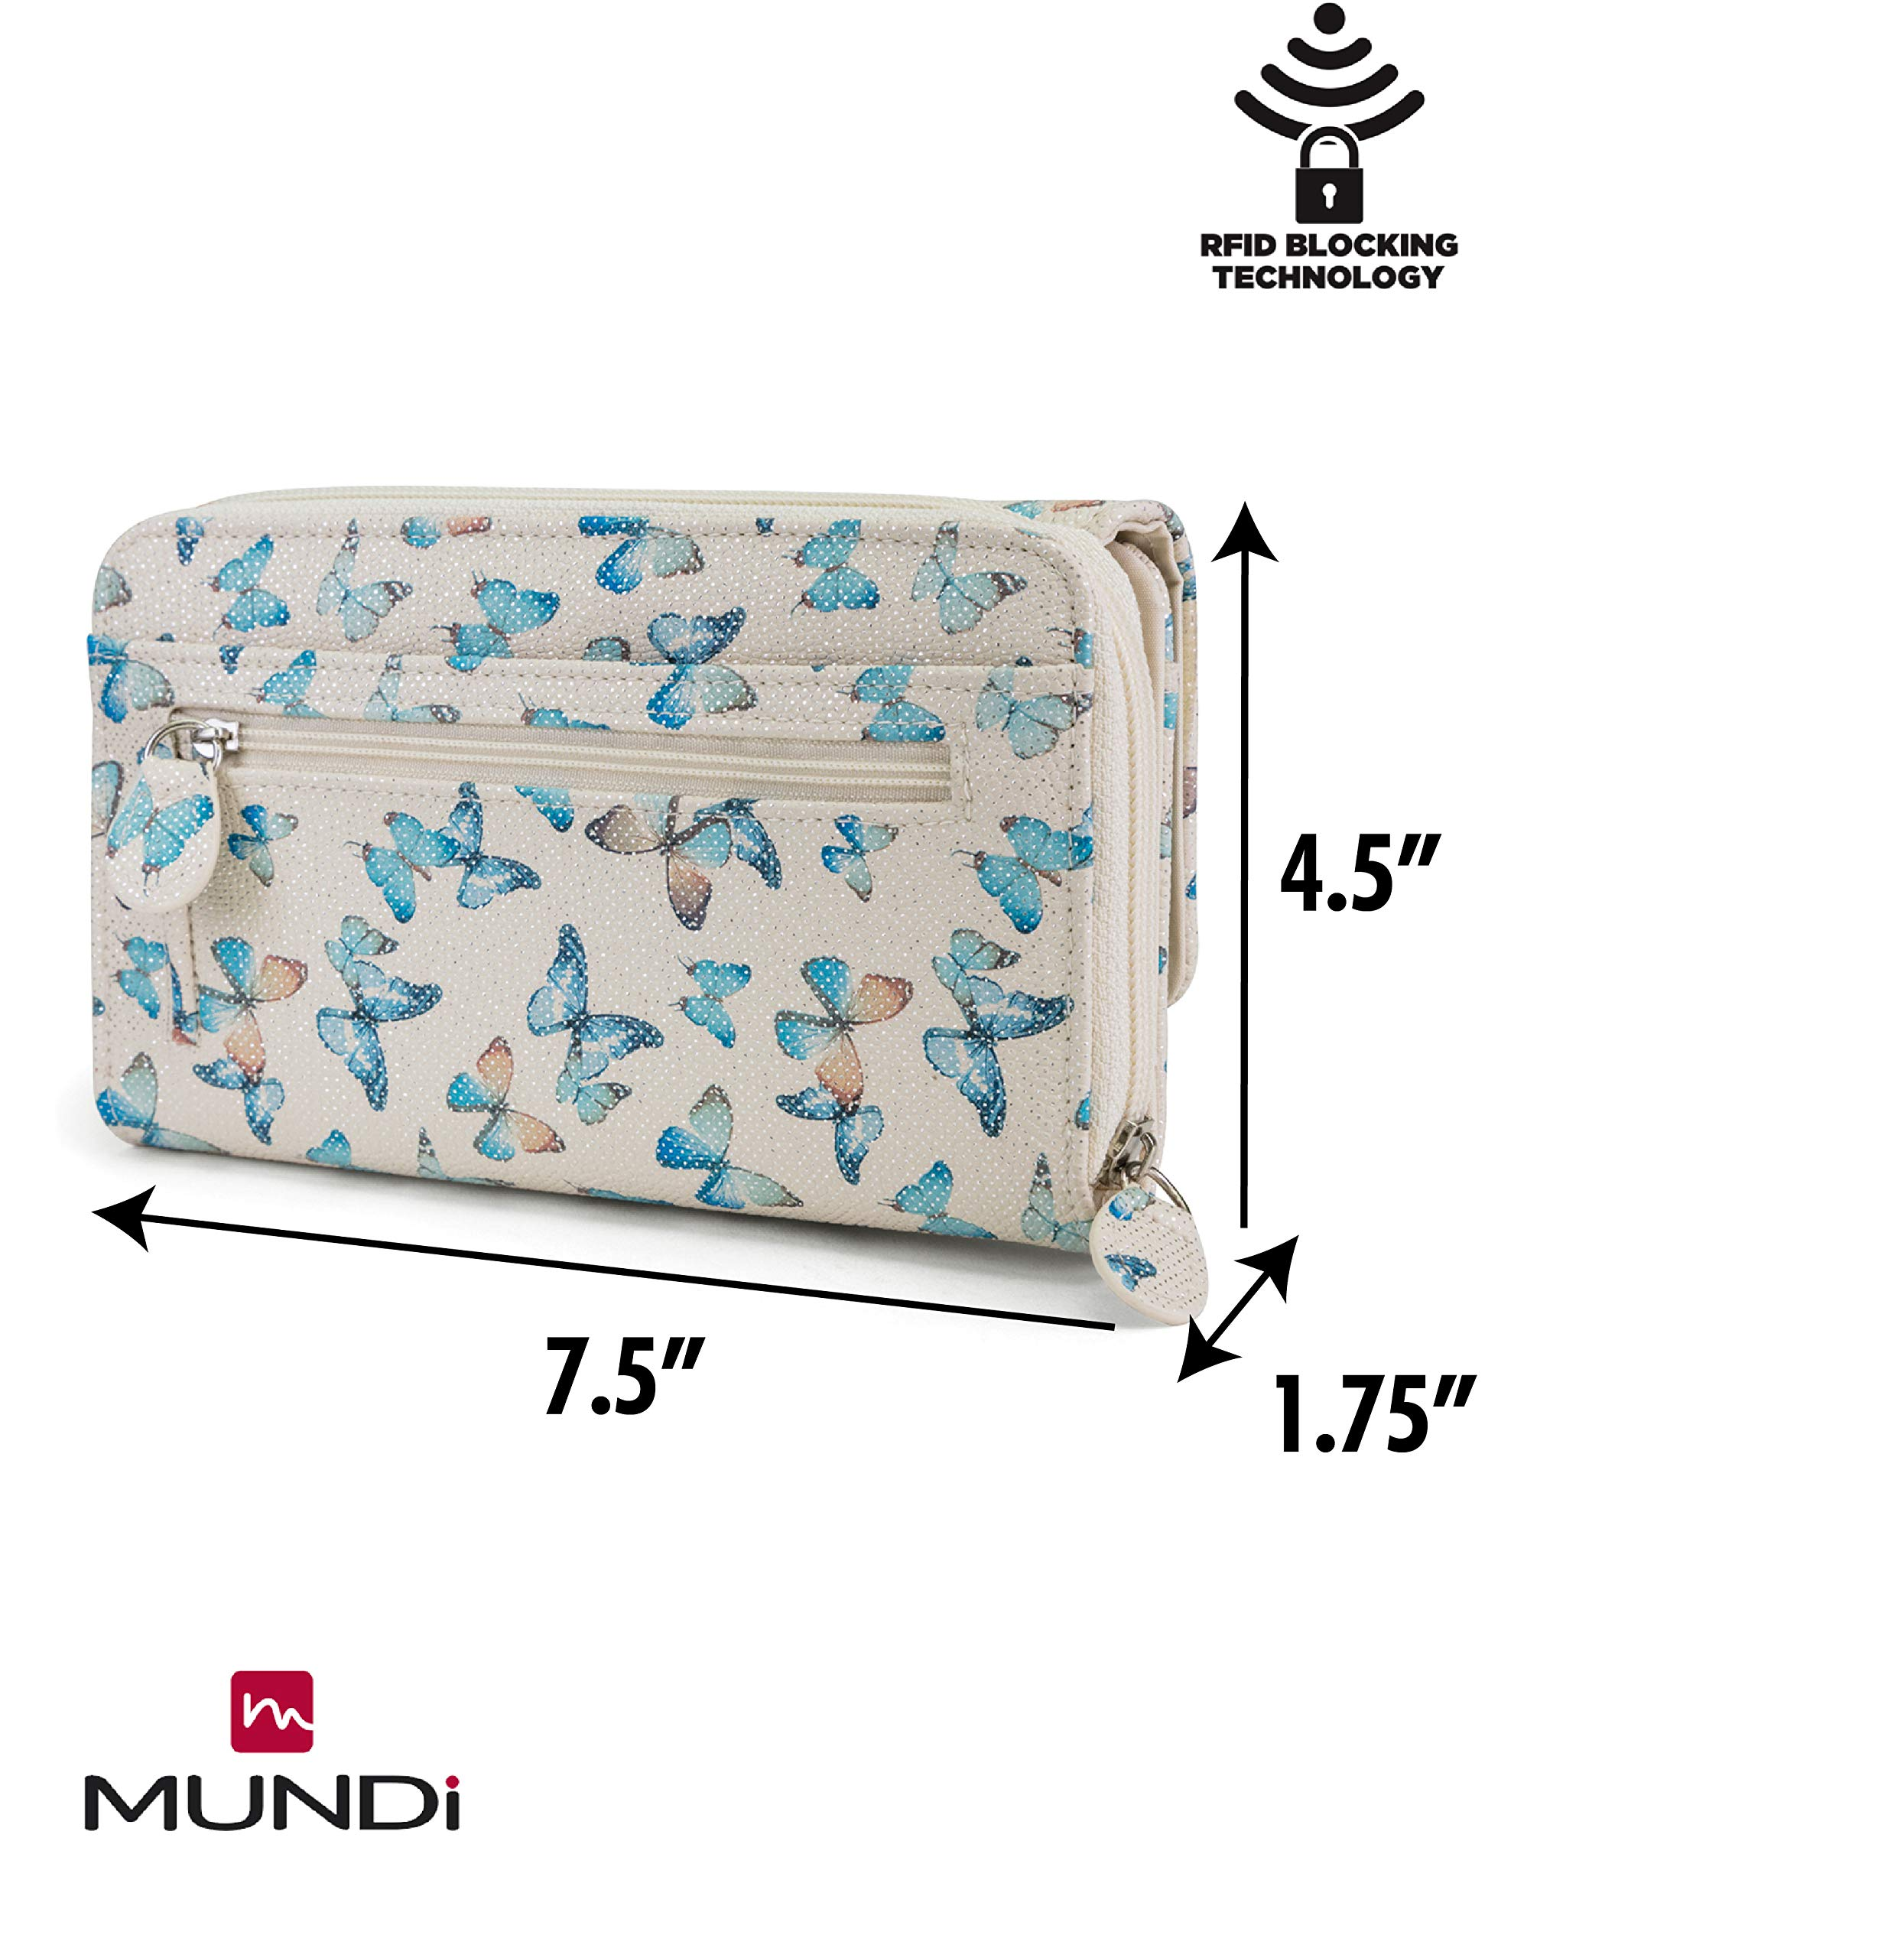 MUNDI Big Fat Womens RFID Blocking Wallet Clutch Organizer Removable Wristlet (Flutter) by Mundi (Image #4)